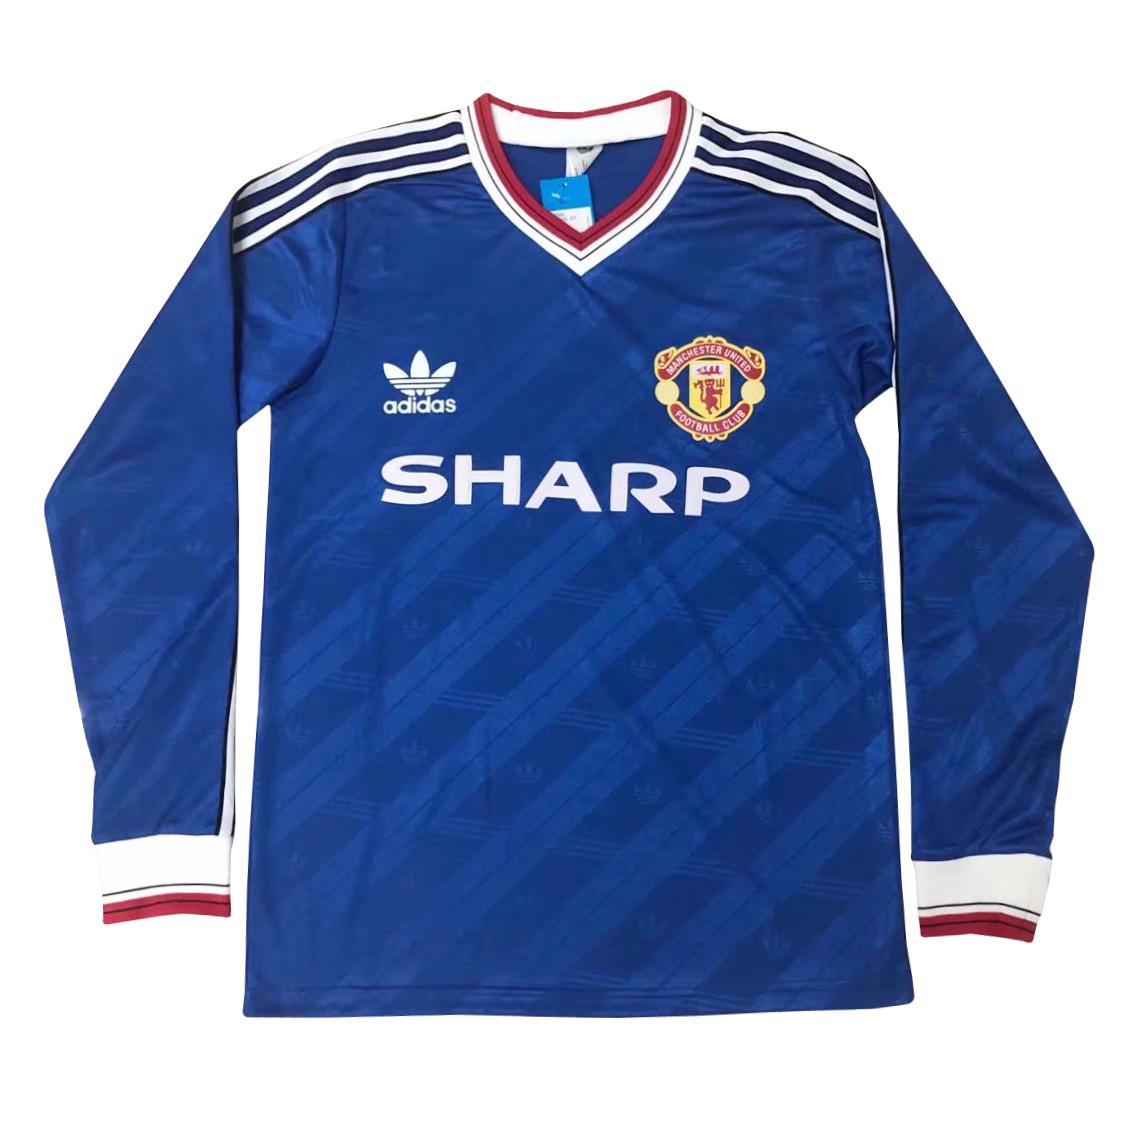 US$ 19.80 - Manchester United Retro Away Jersey Long Sleeve Mens 1986/1987 - www.fcsoccerworld.com